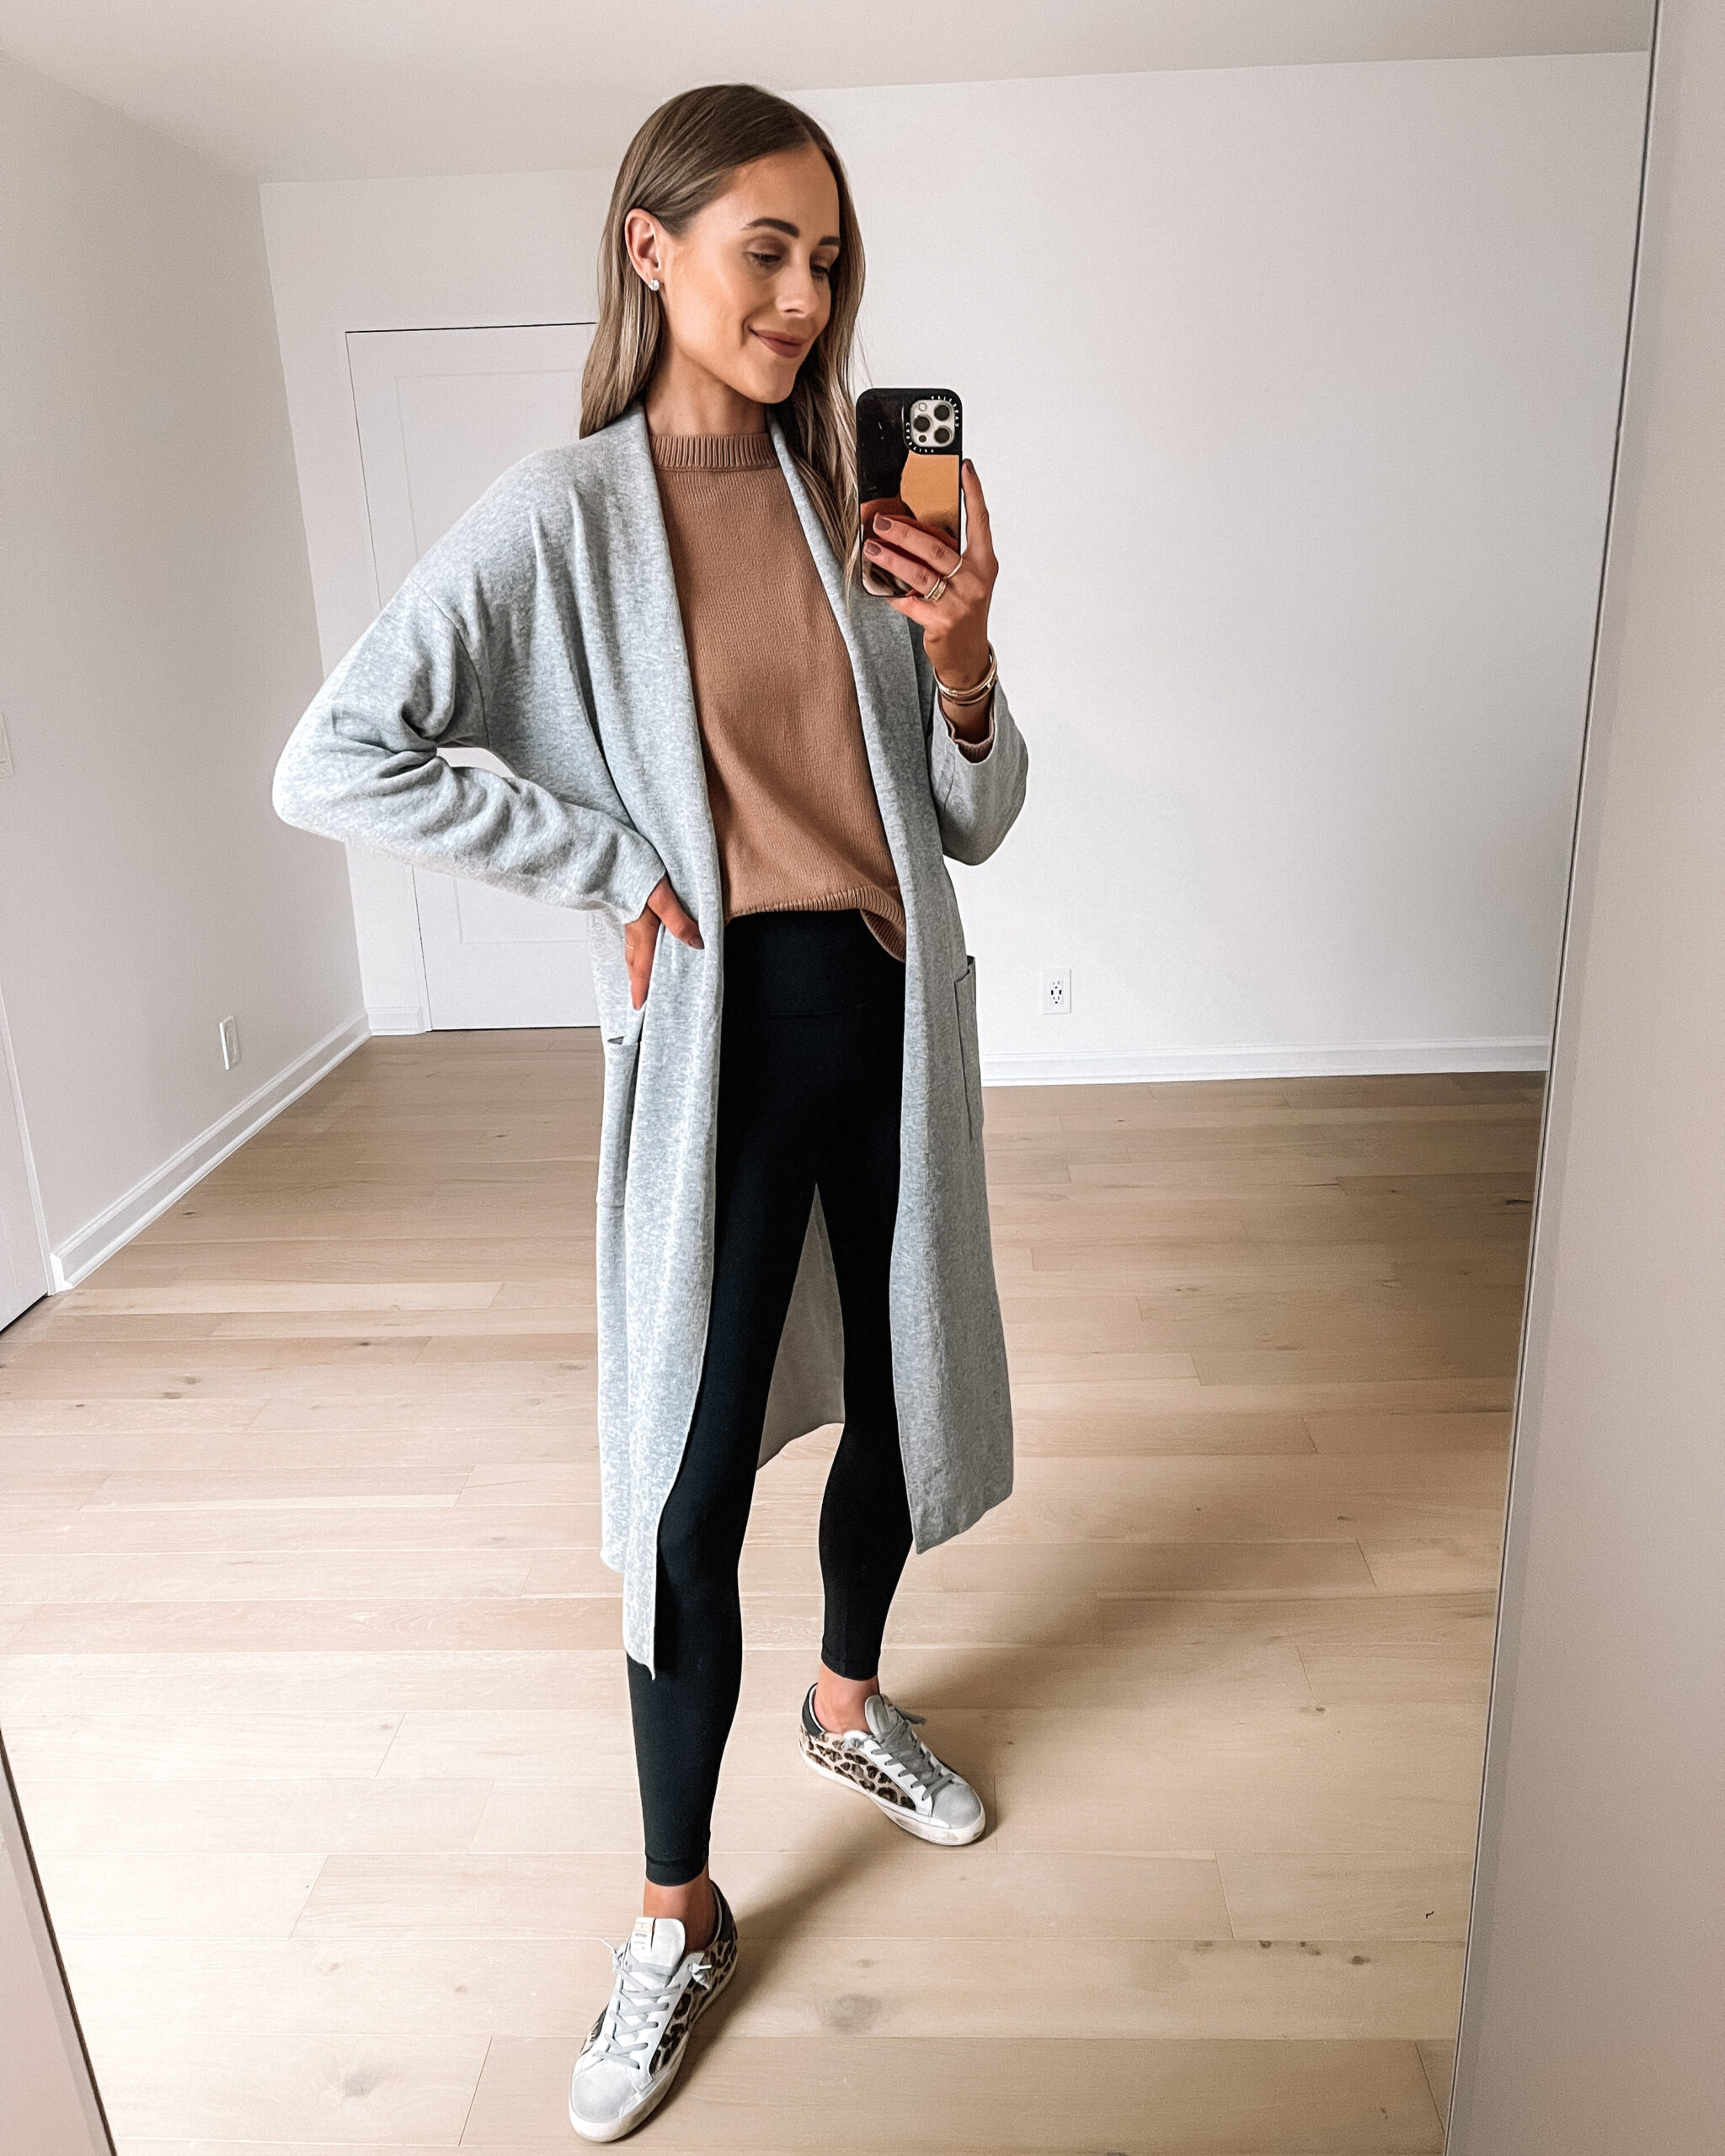 Fashion Jackson Wearing Amazon Fashion Long Grey Cardigan Tan Sweater Black Leggings Leopard Golden Goose Sneakers Outfit